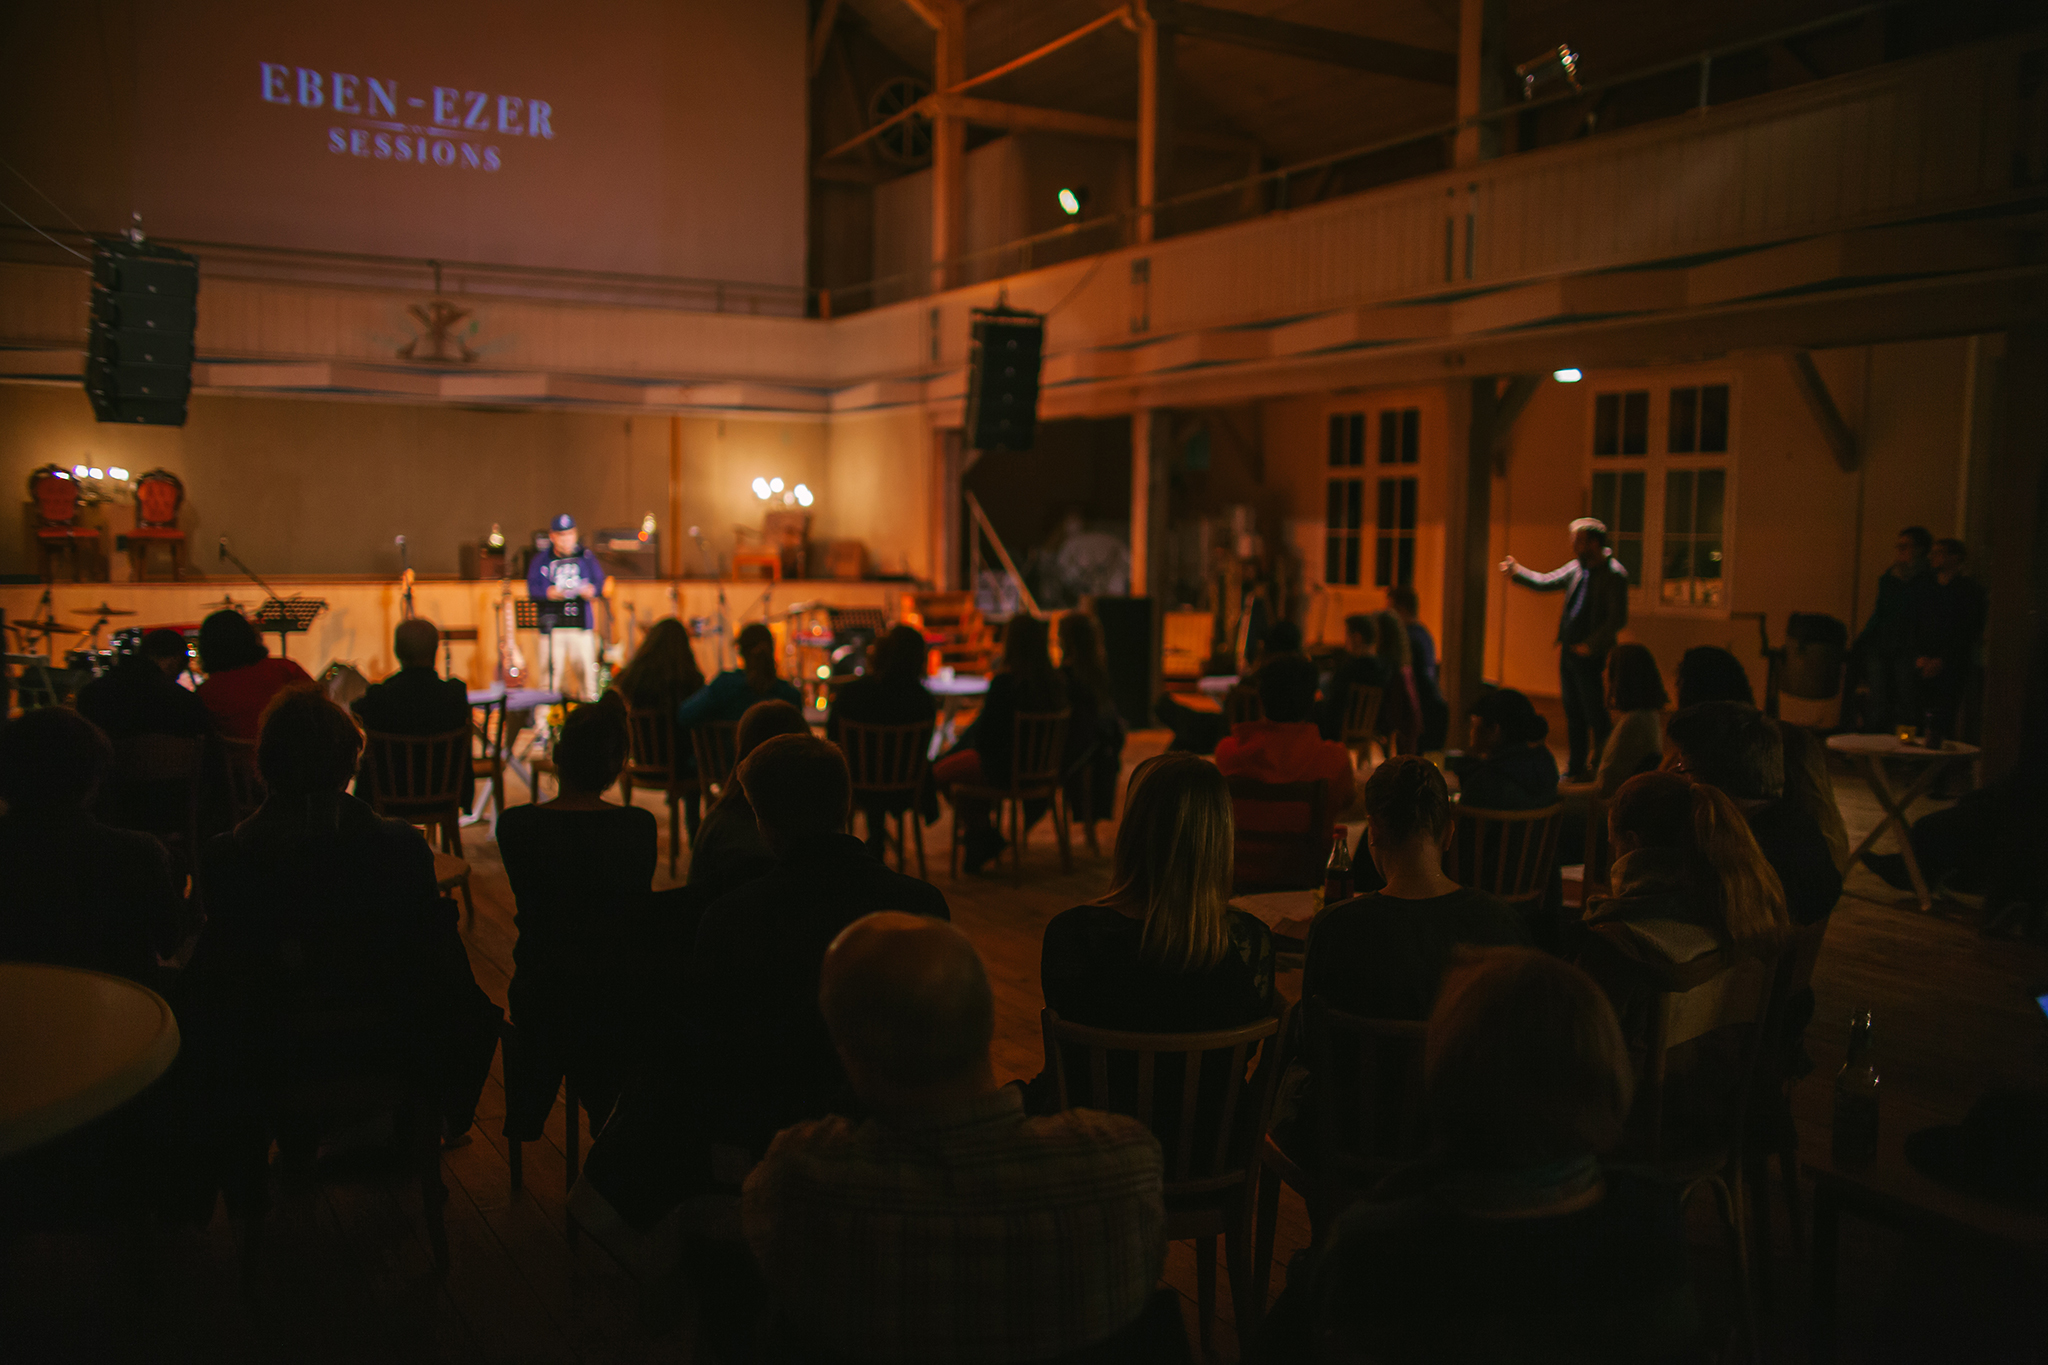 Eben-Ezer-Sessions am 18.10.2019: Publikum beim Poetry-Slam (Foto: Knut Burmeister, ALLTAG)